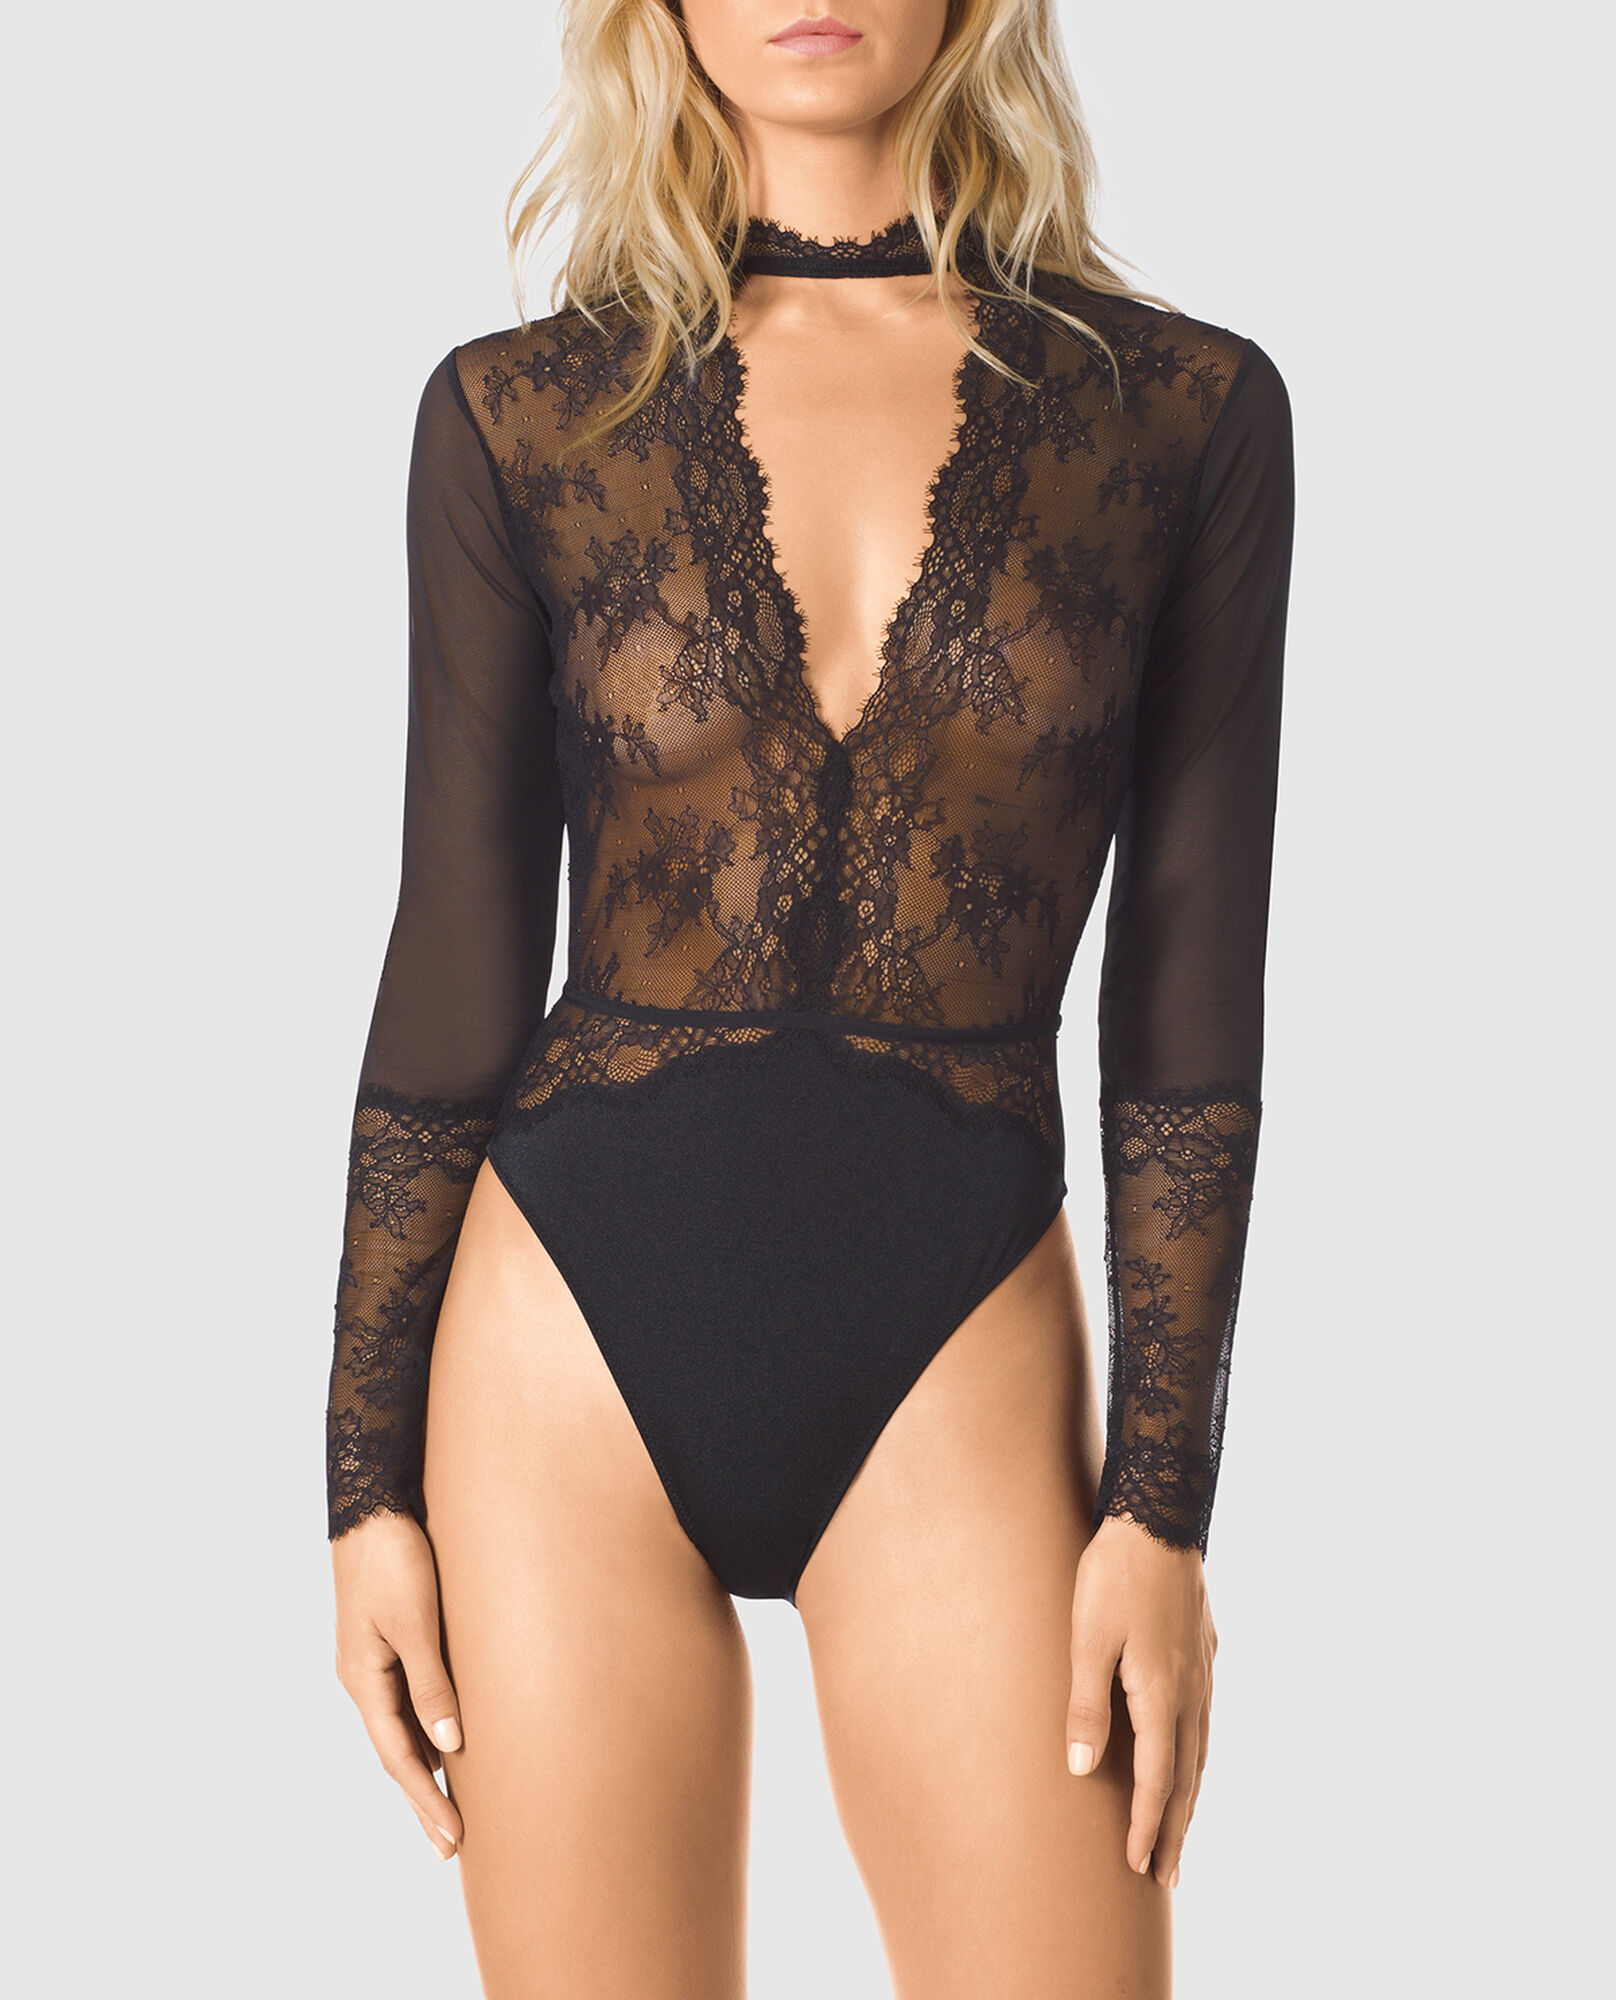 319fe9eef Long Sleeve Lace Bodysuit - 24SEXY New Arrivals - La Senza Lingerie